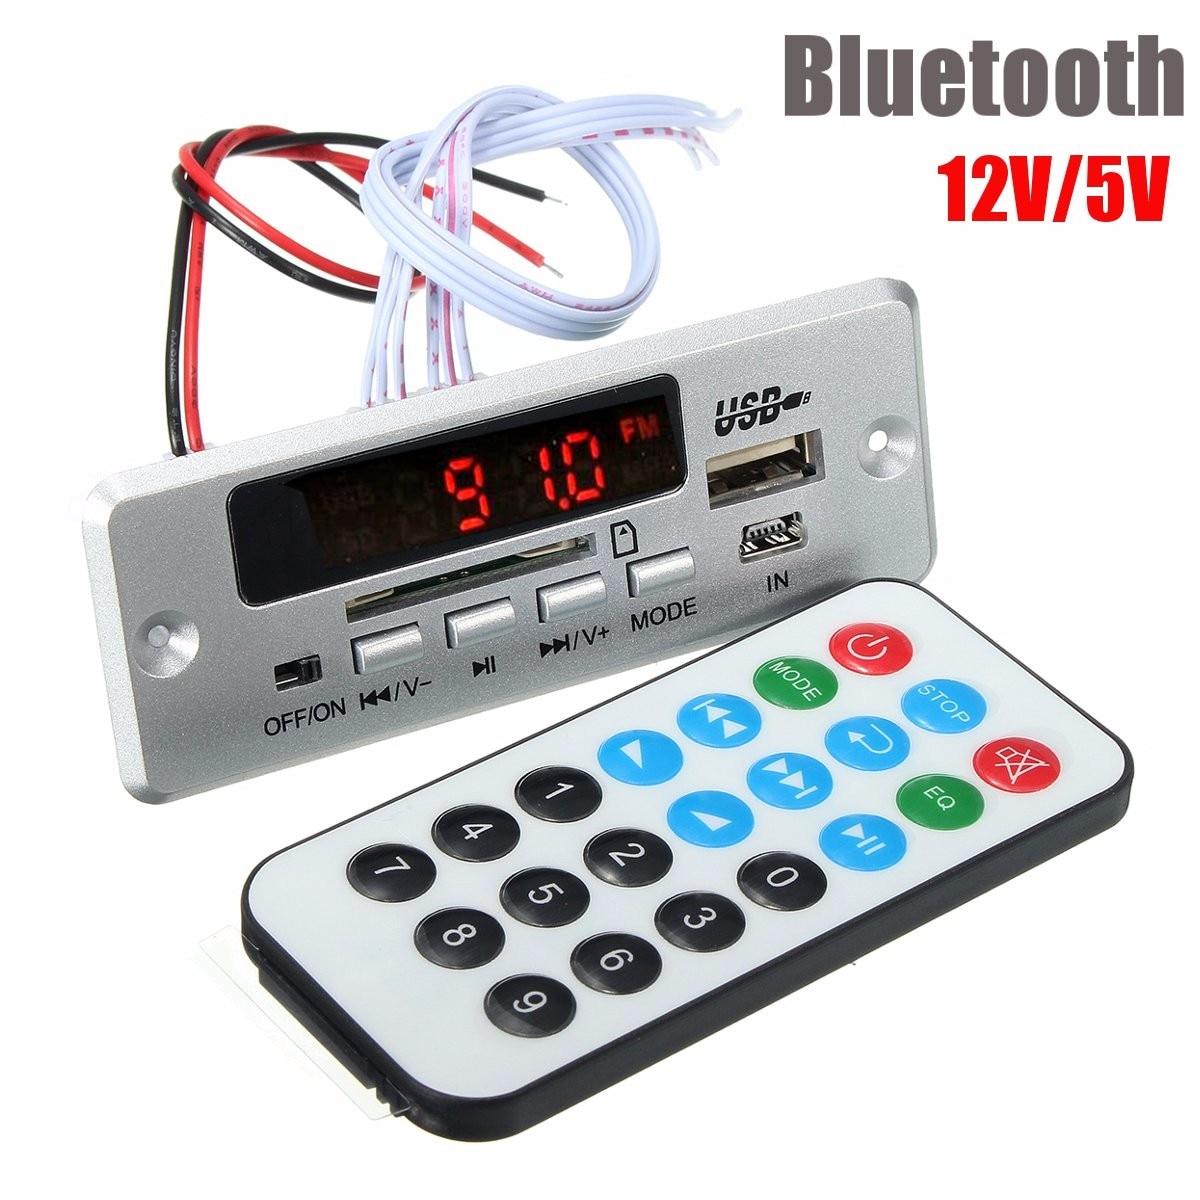 Unterhaltungselektronik Neue Ankunft Universal Auto Led Usb Aux Fm Bluetooth Mp3 Decode Bord Radio Verstärker Remote Digital-analog-konverter Dc12v /5 V